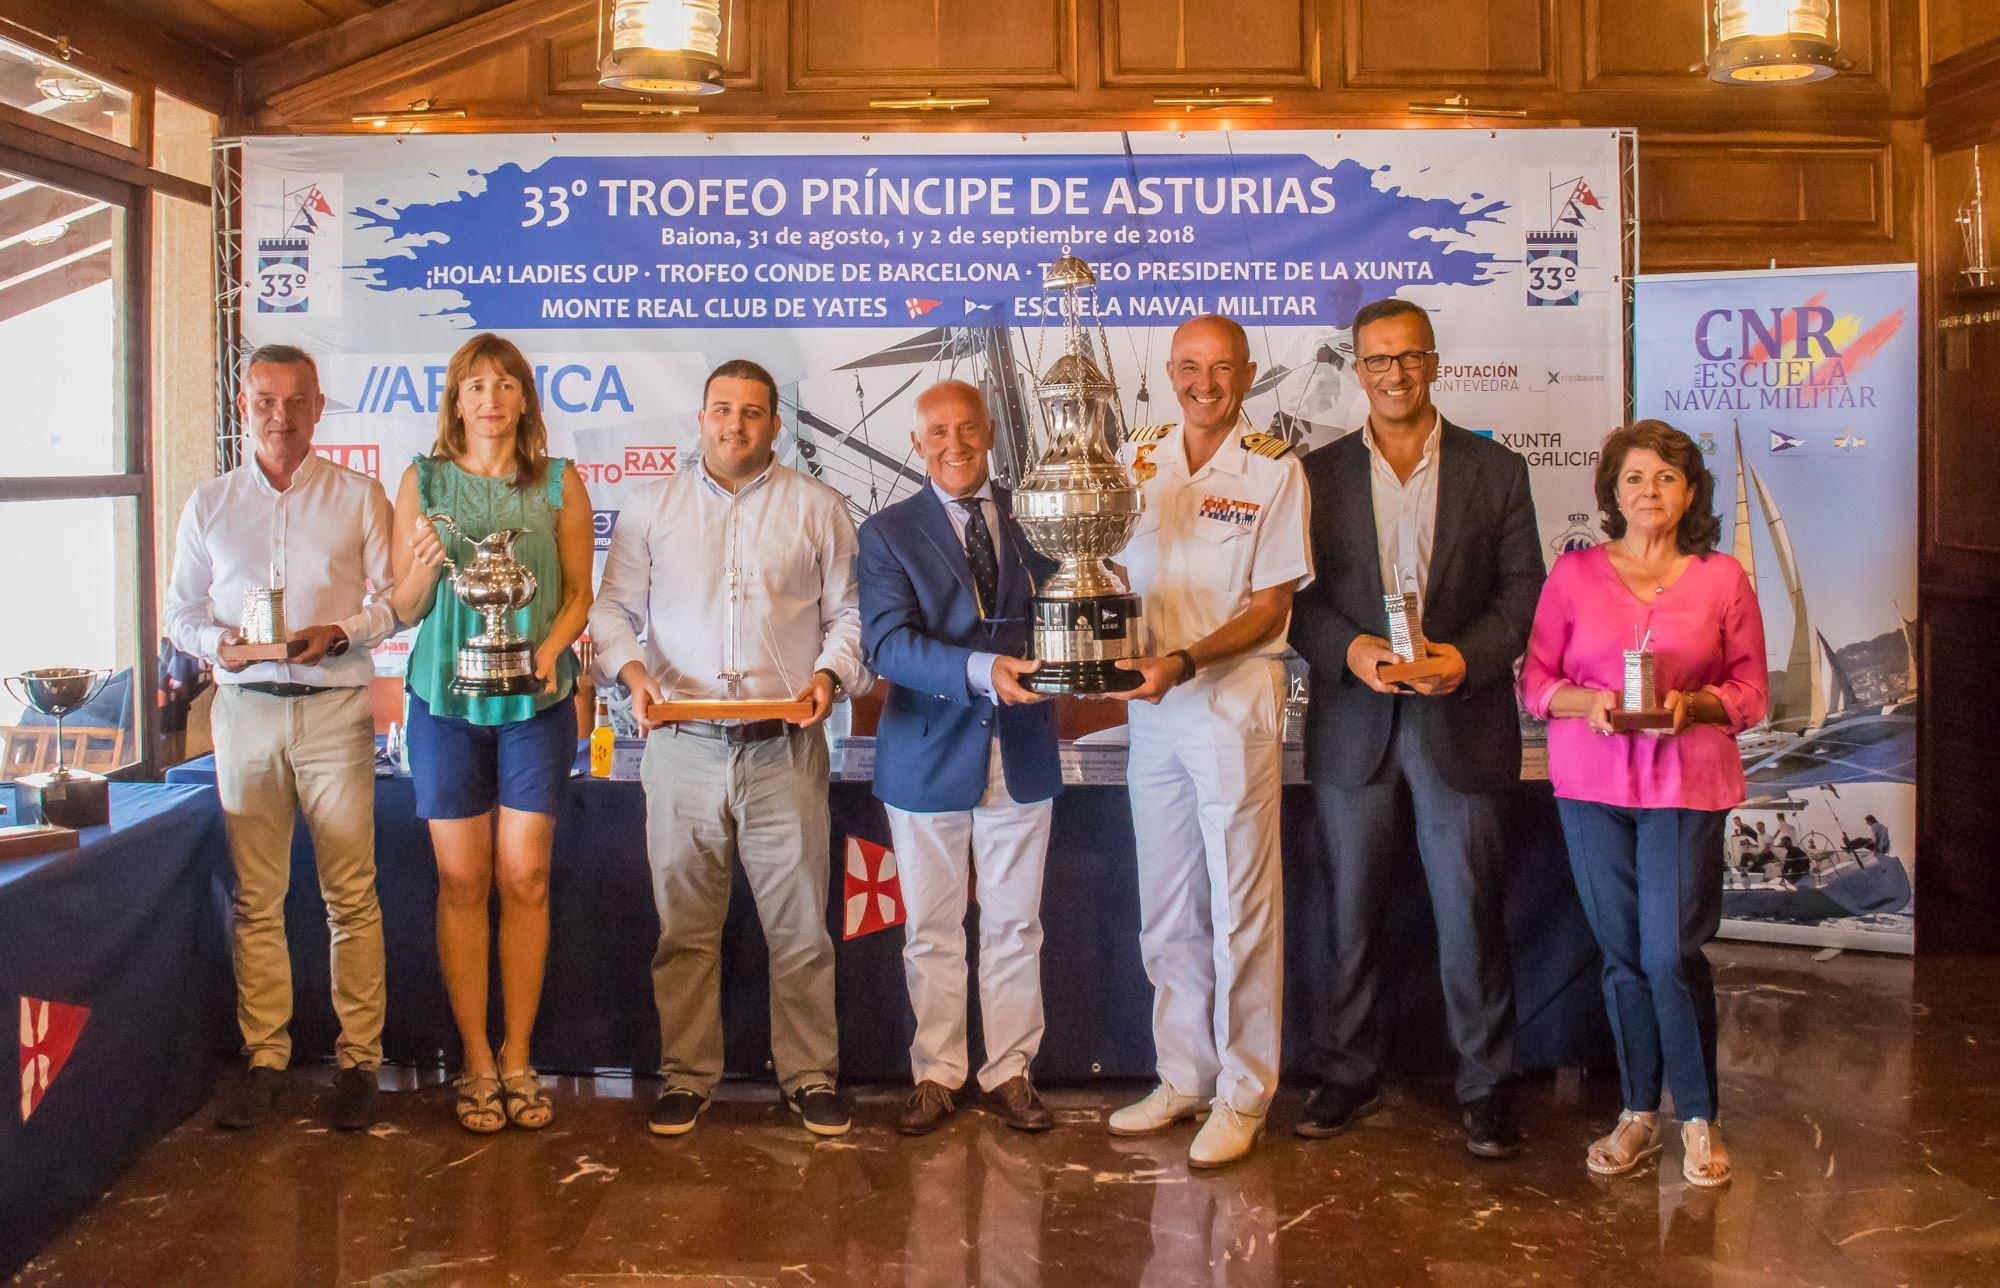 Presentación do 33º Trofeo Príncipe de Asturias